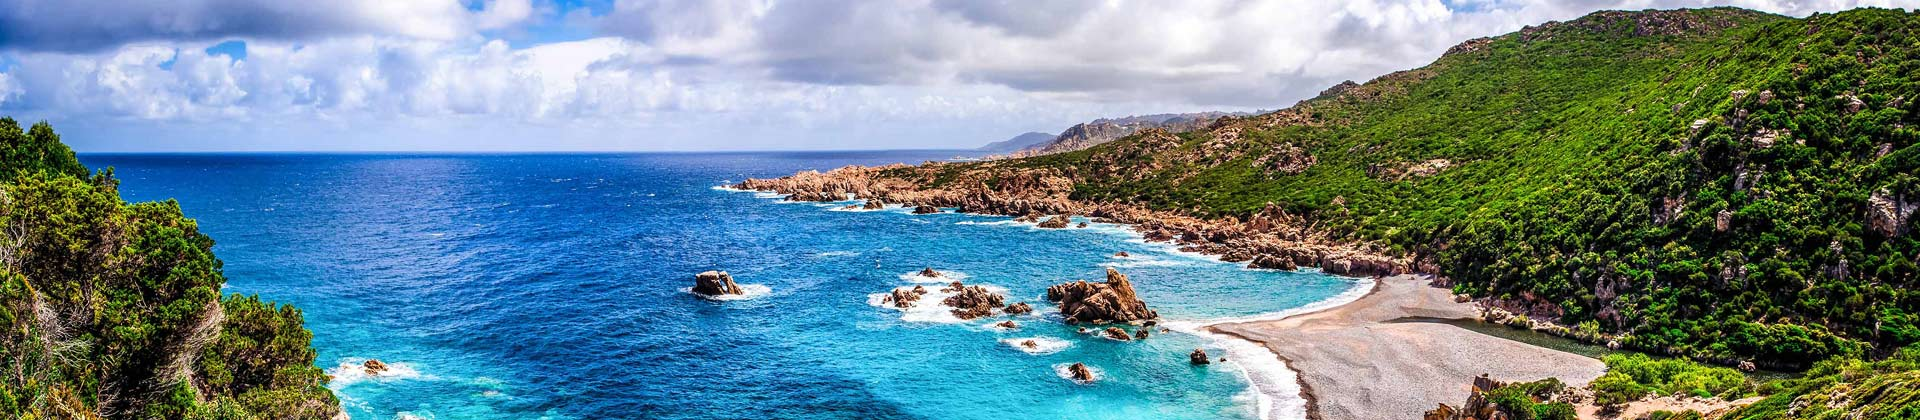 De kust van Sardinie